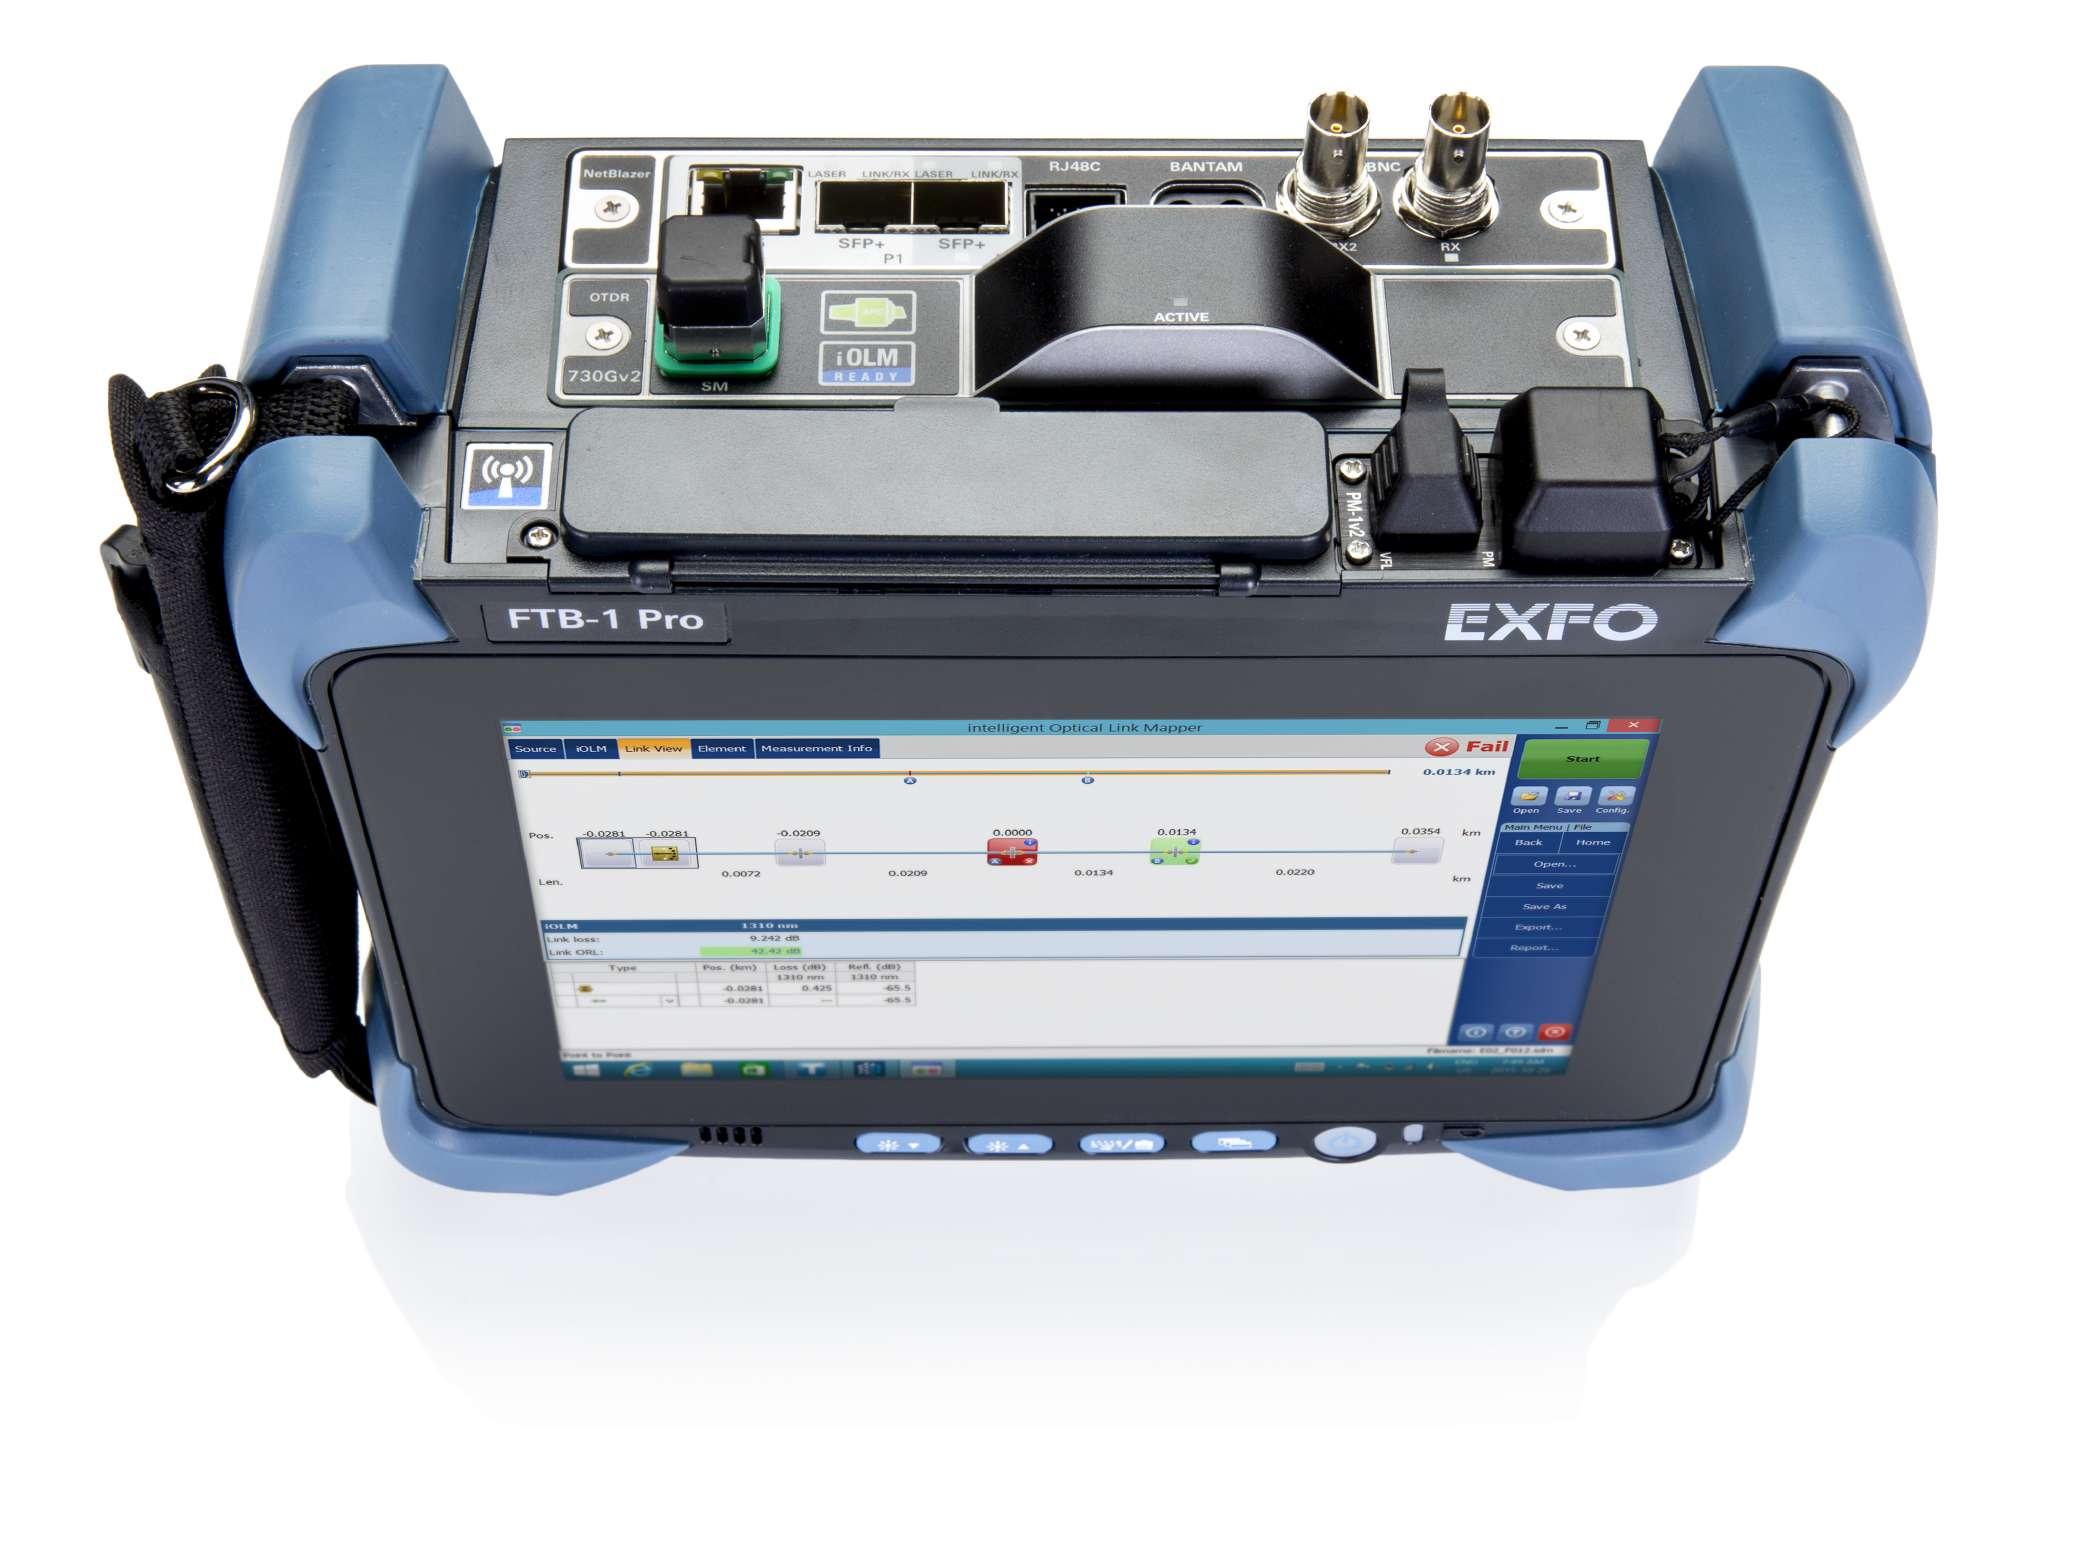 EXFO FTB-700Gv2 : Комбинированный мультисервисный тестер TD + OTDR